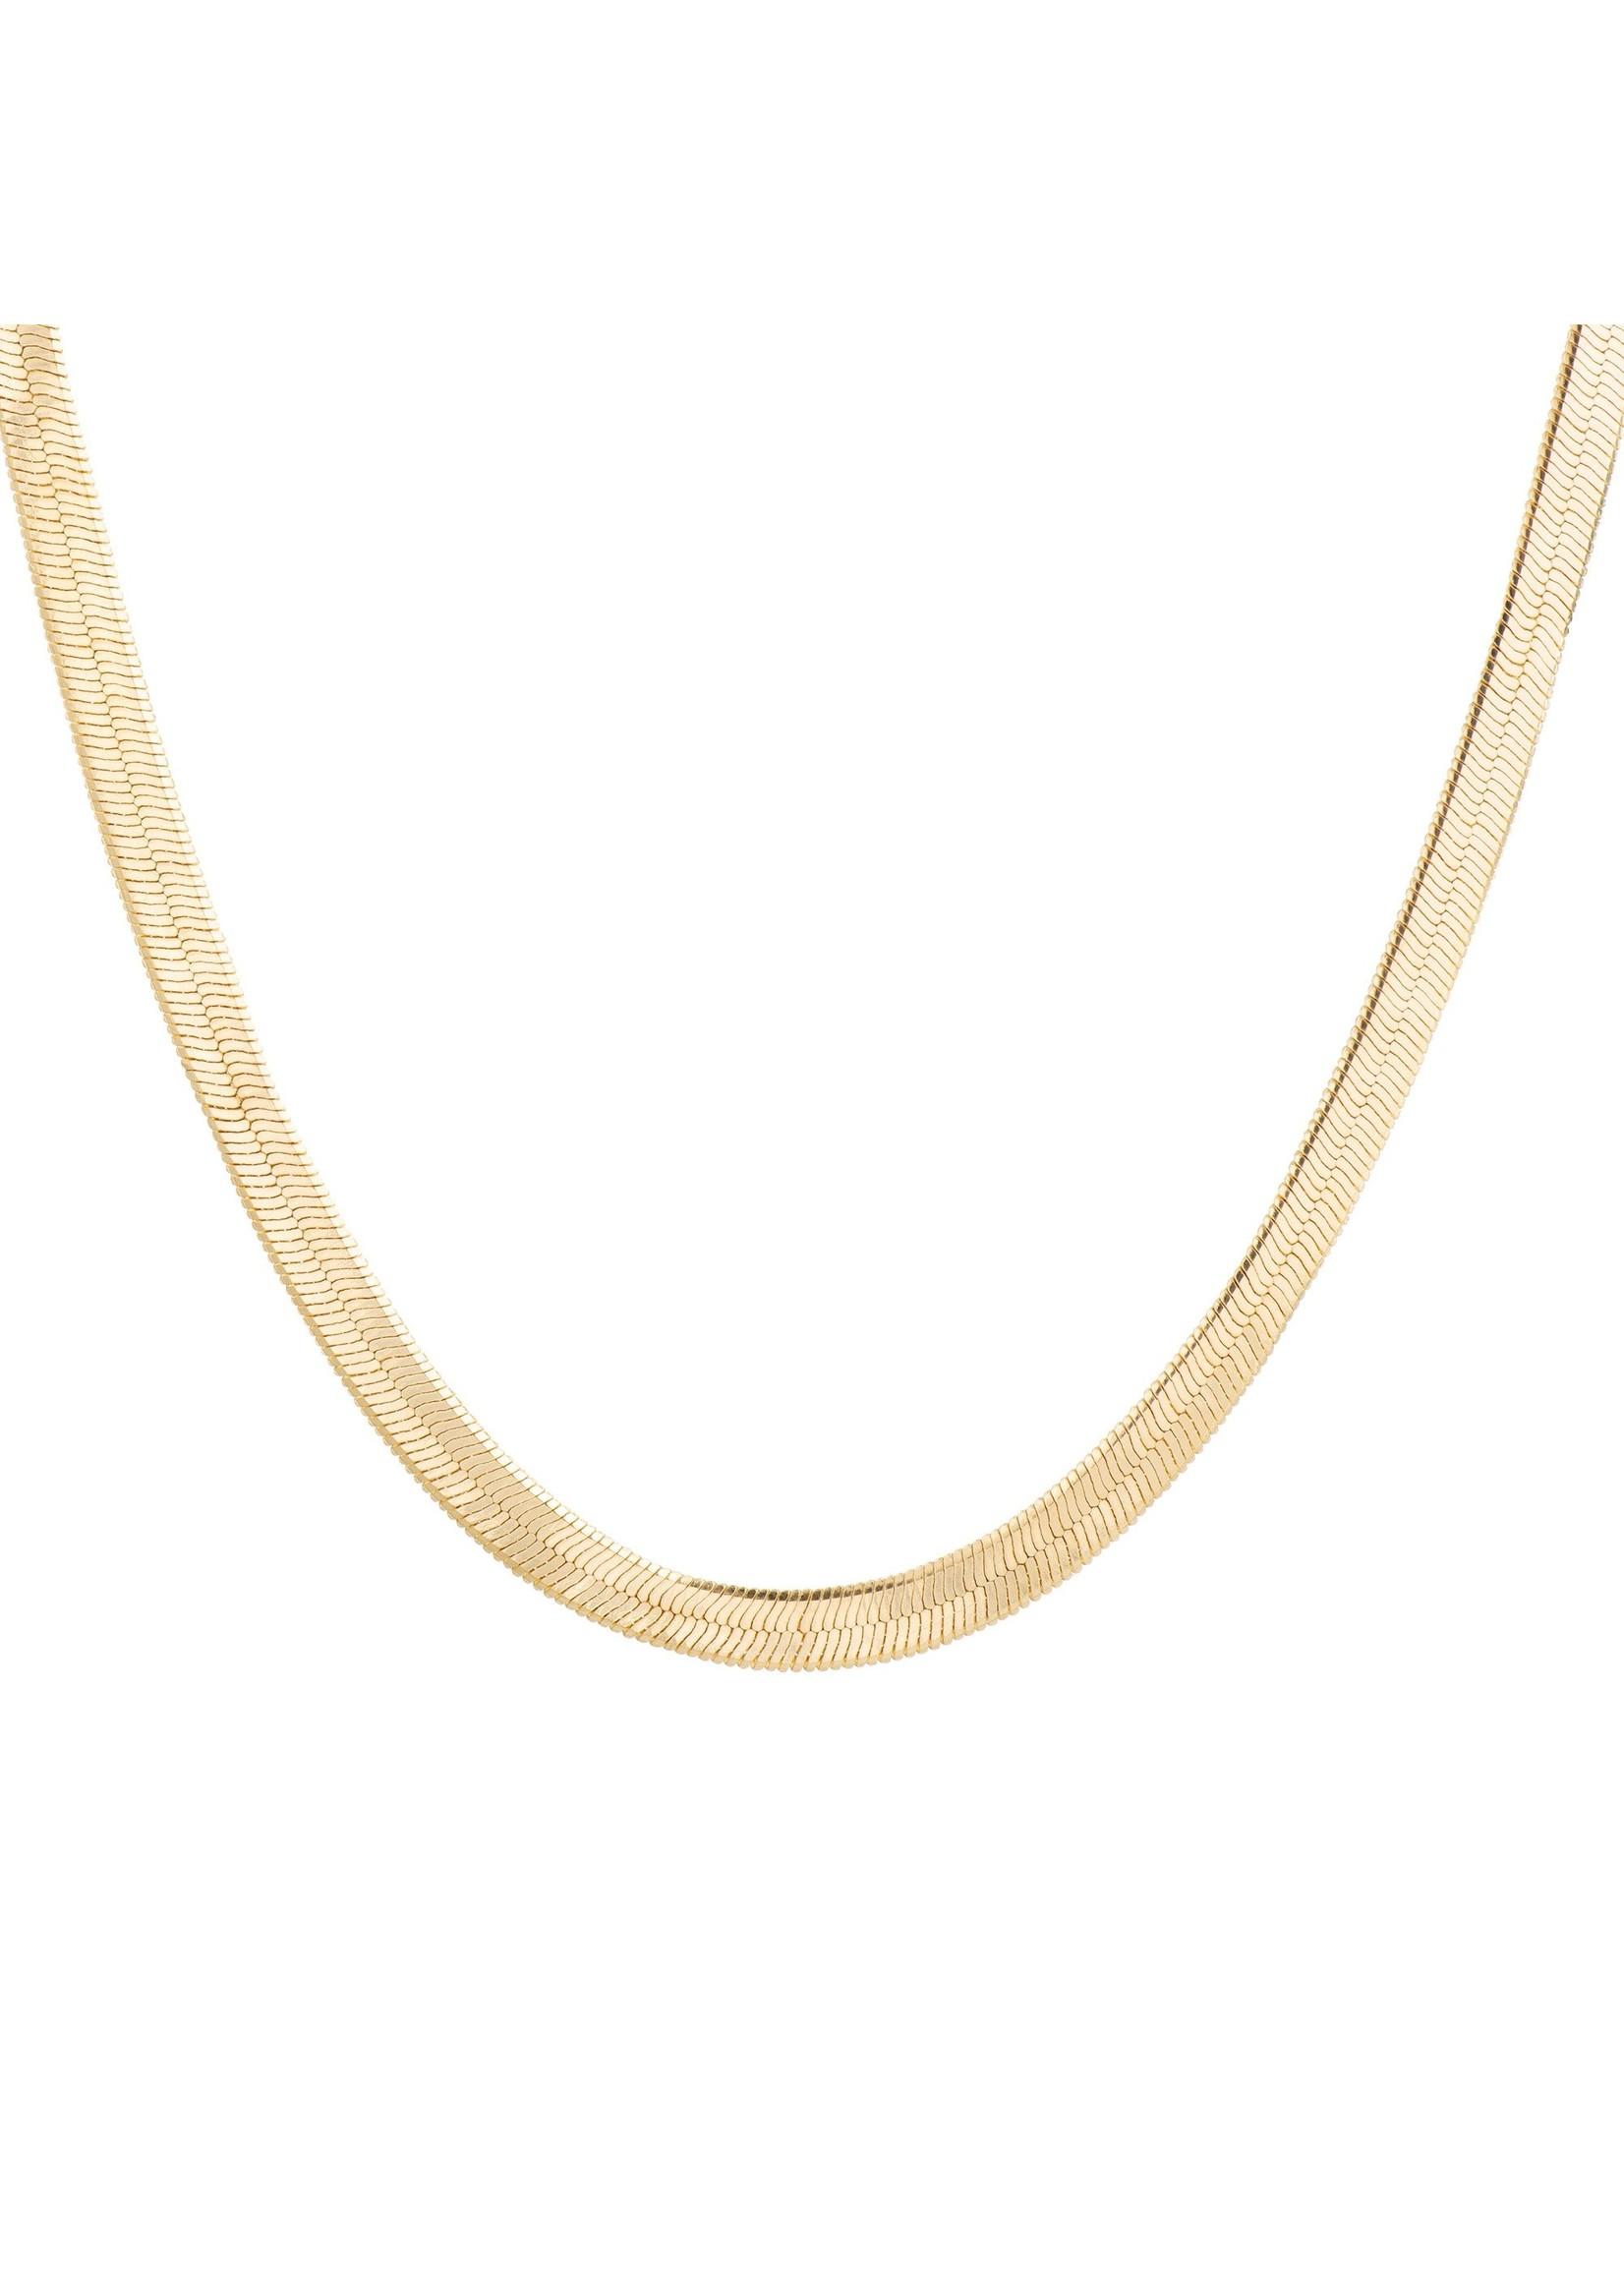 Lolo Jewellery Herringbone - Gold